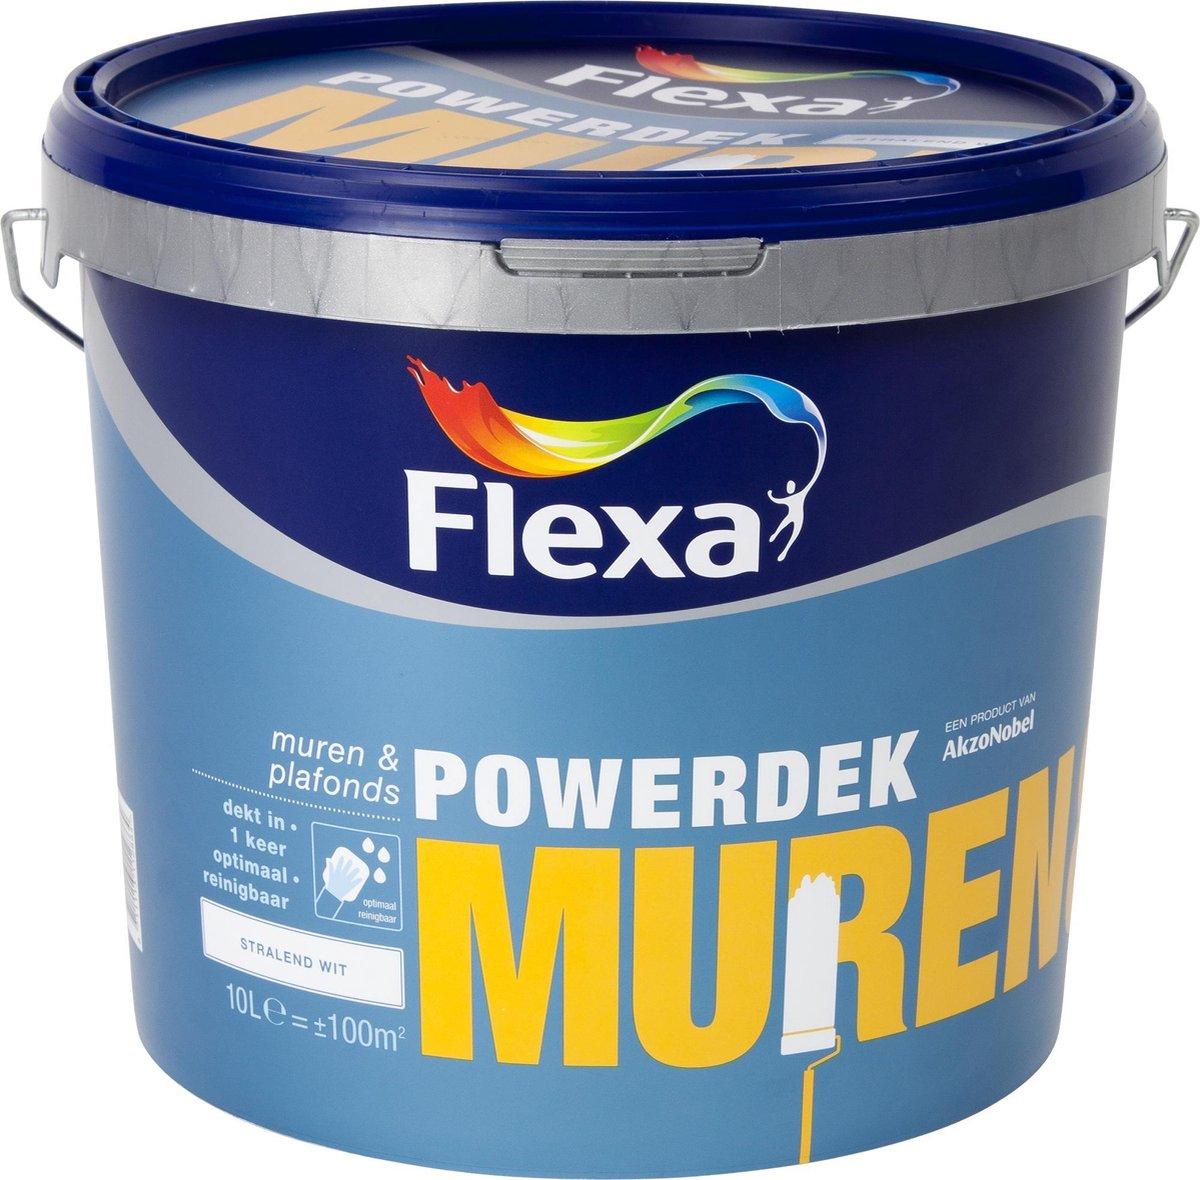 Flexa Powerdek Muren & Plafonds Muurverf - Stralend Wit - 10 liter